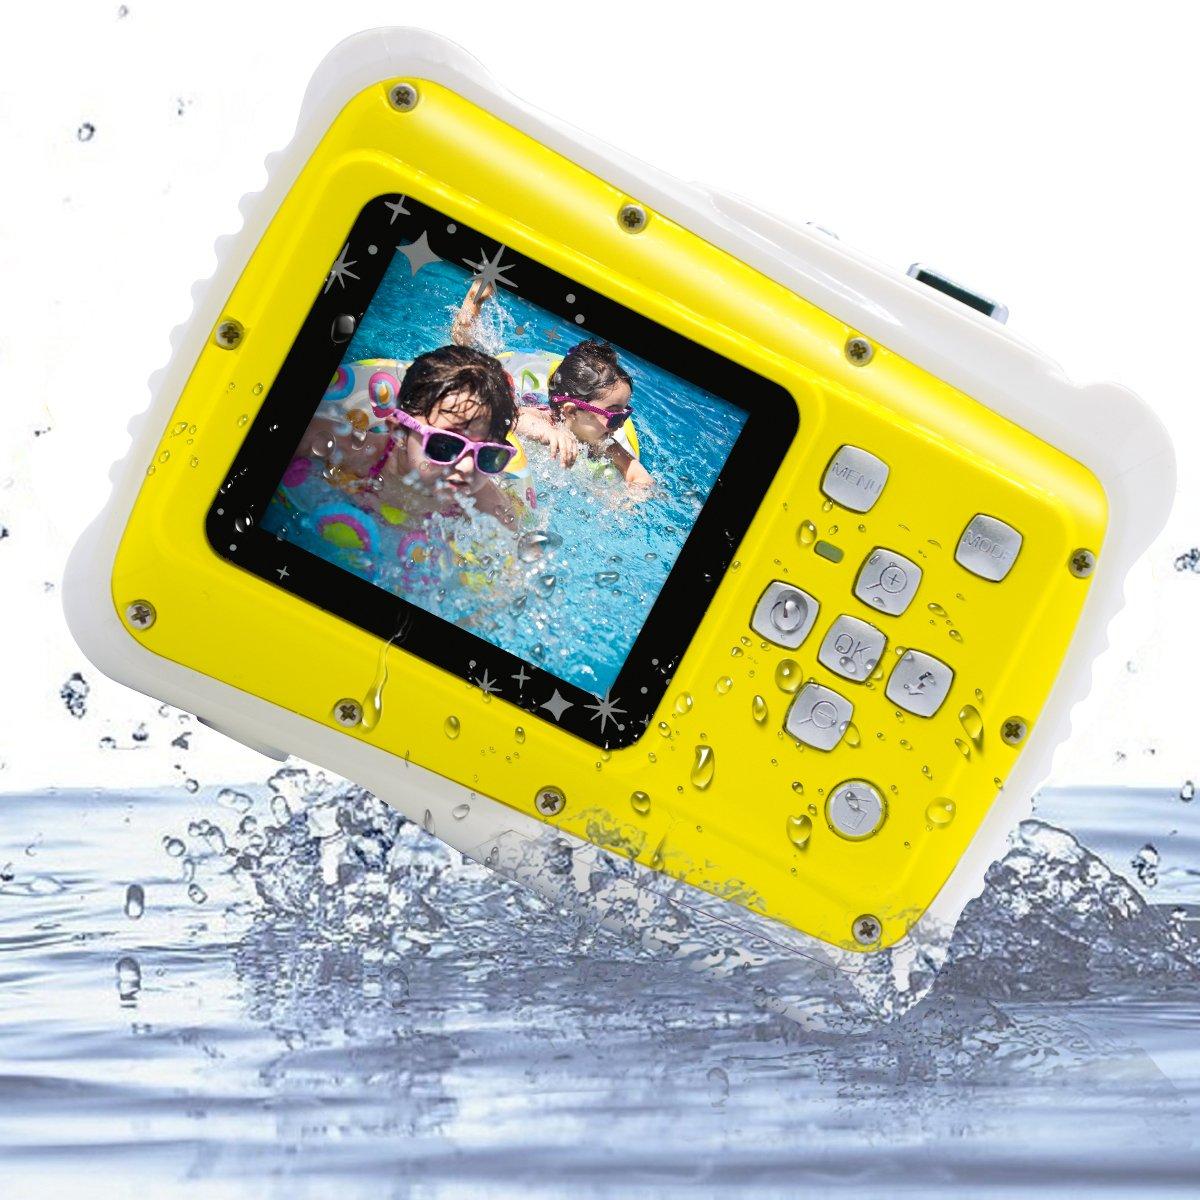 Kids Digital Camera, Vmotal Kids Waterproof Camera 2.0 Inch TFT Display 8MP Waterproof Camera for Children (Yellow) by Vmotal